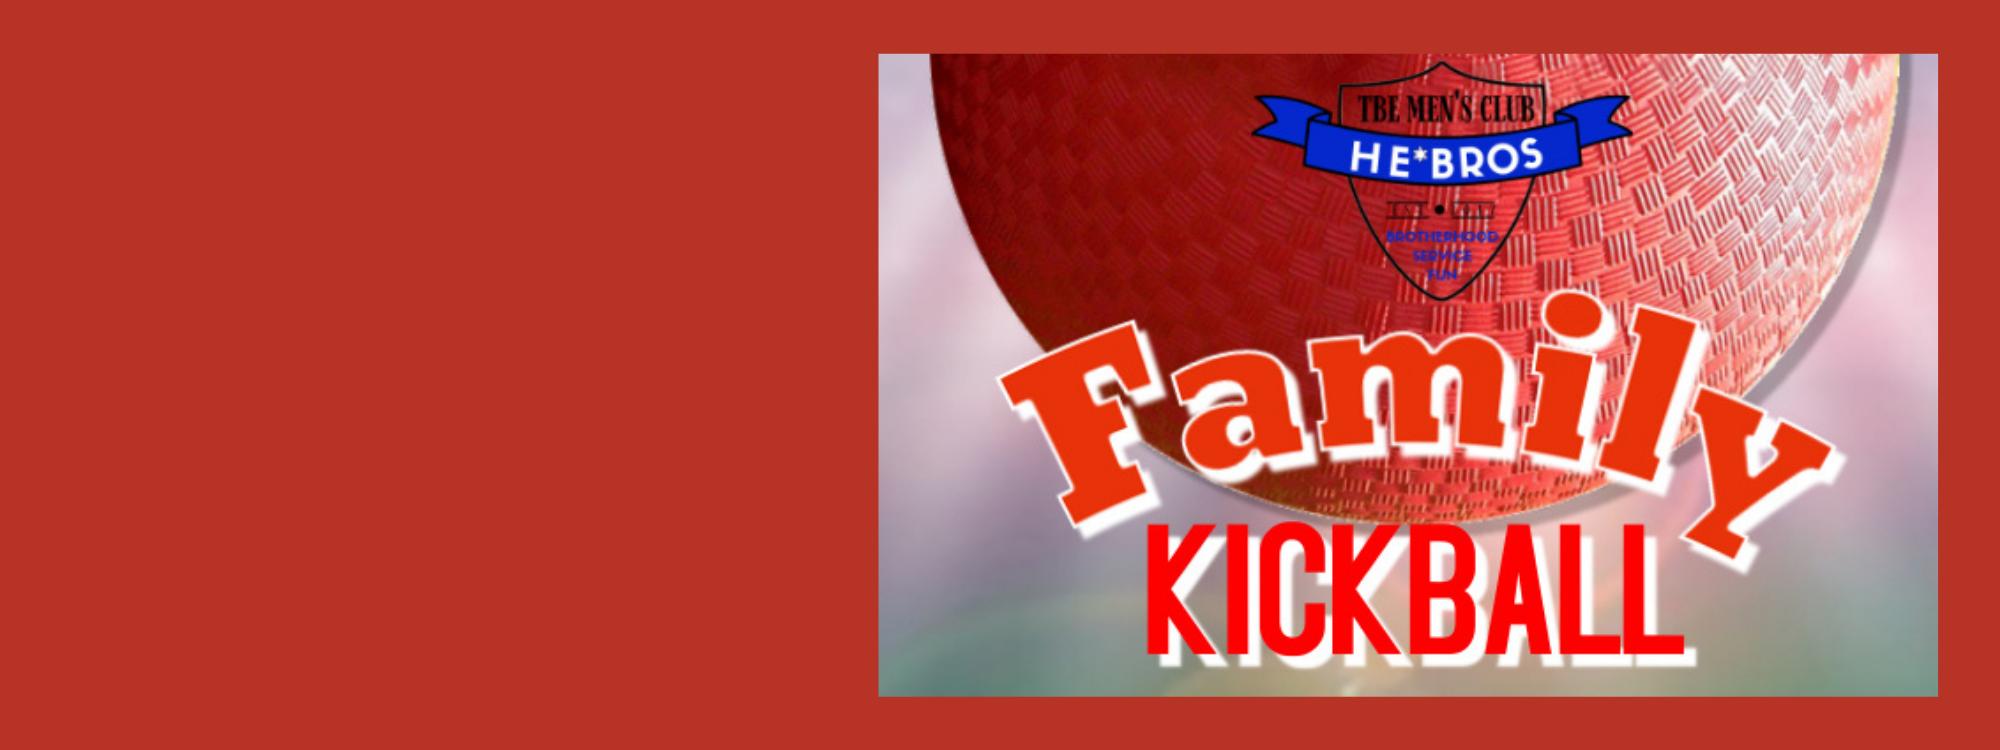 "<a href=""https://www.templebethemet.org/he-bros-mens-club""                                     target=""_blank"">                                                                 <span class=""slider_title"">                                     Family Kickball Tournament                                </span>                                                                 </a>                                                                                                                                                                                       <span class=""slider_description"">May 16 @ 1:00 PM, Kickball, BBQ and Fun!</span>                                                                                     <a href=""https://www.templebethemet.org/he-bros-mens-club"" class=""slider_link""                             target=""_blank"">                             More Details                            </a>"